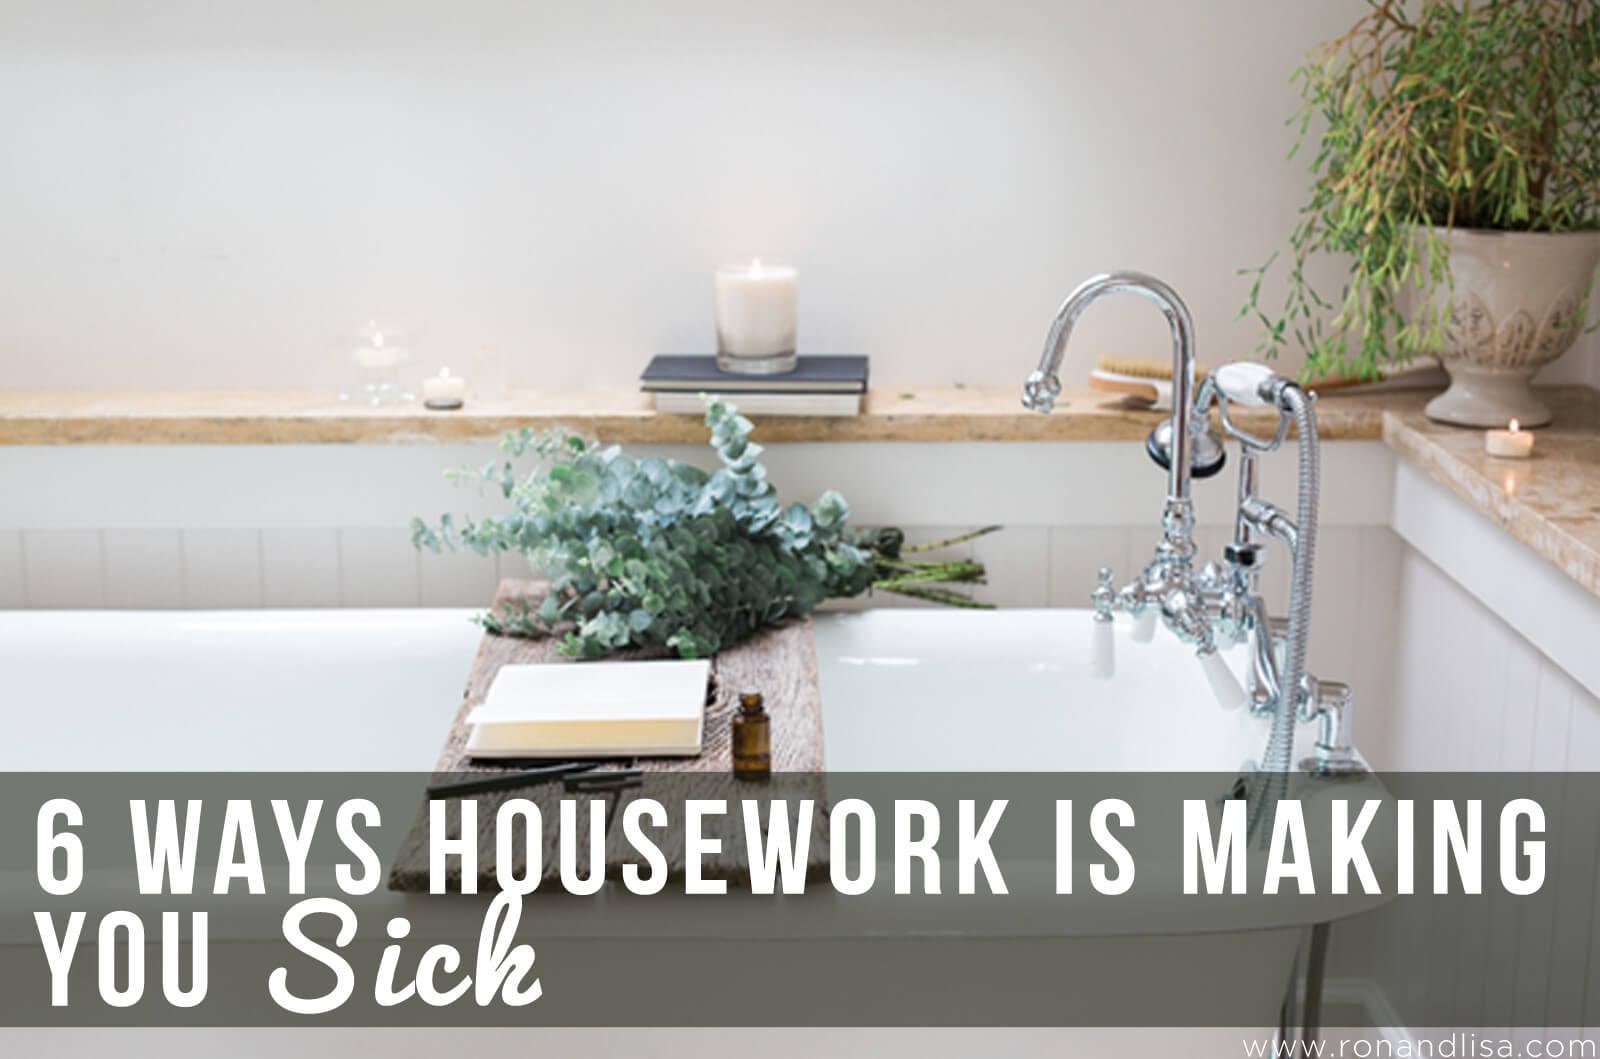 6 Ways Housework Is Making You Sick